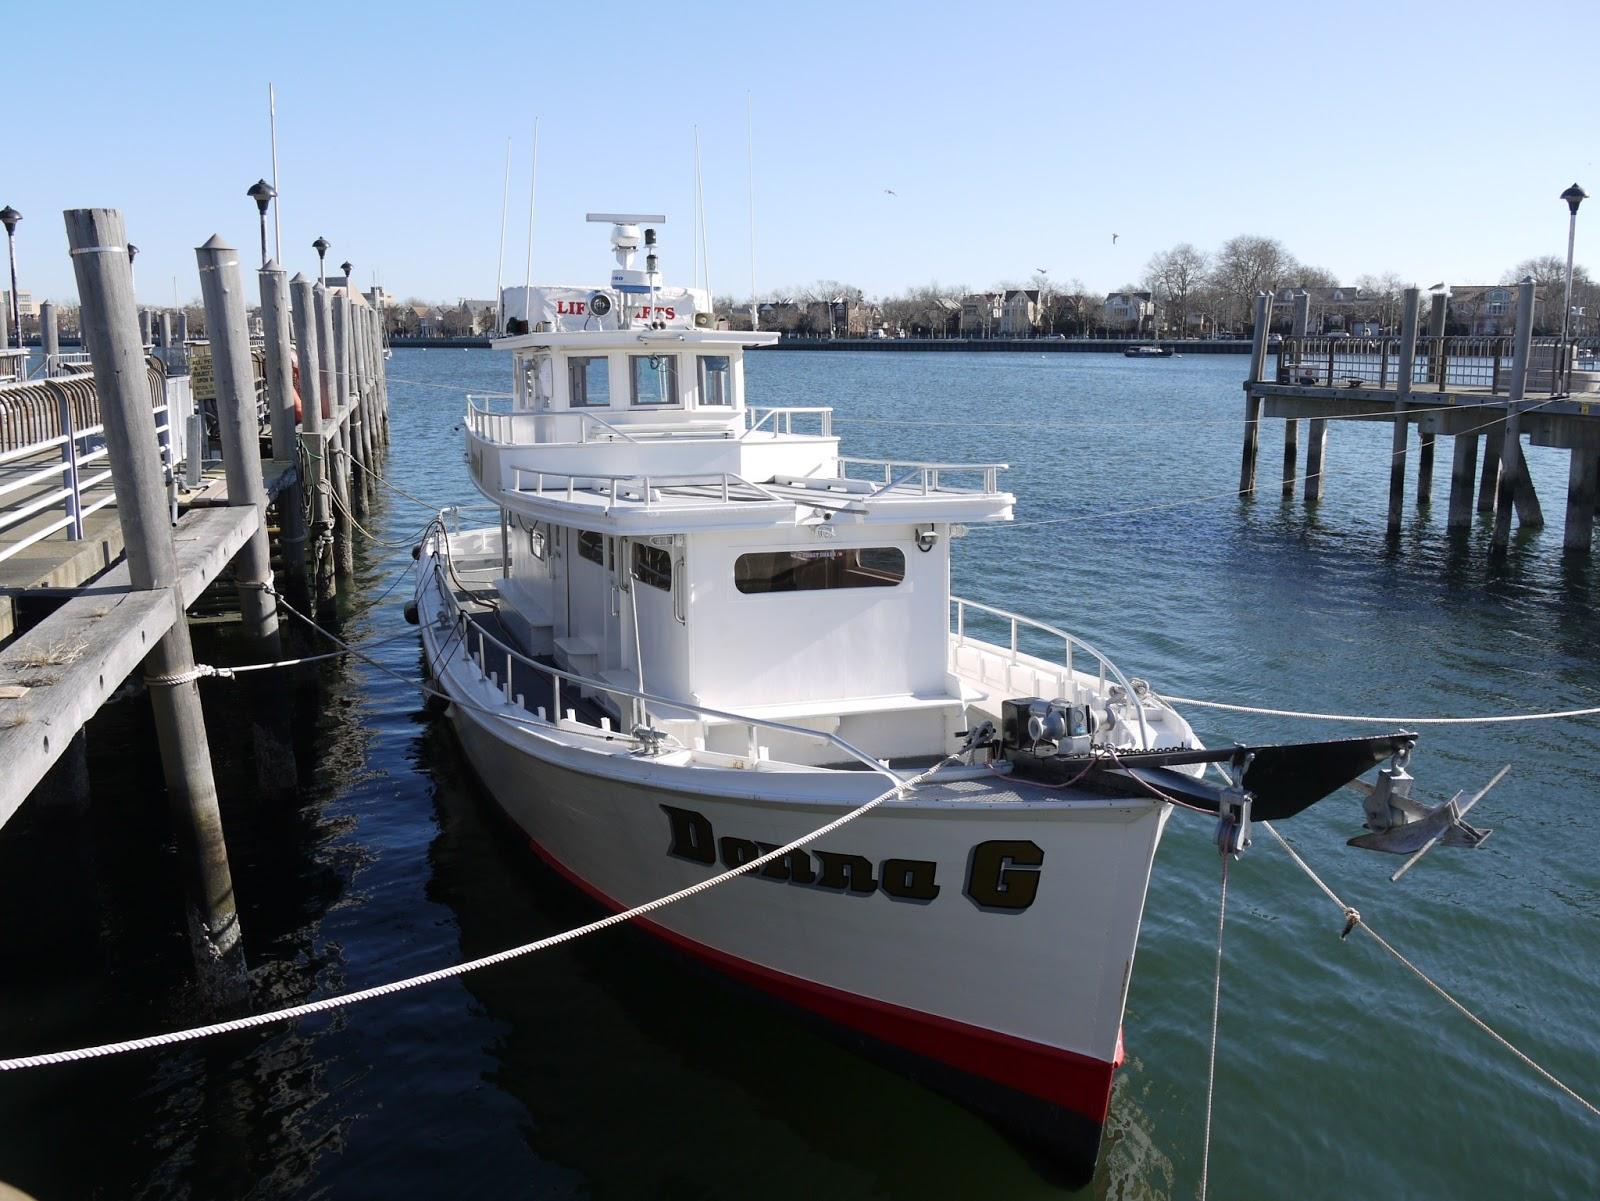 Frogma february 2013 for Sheepshead bay fishing boats